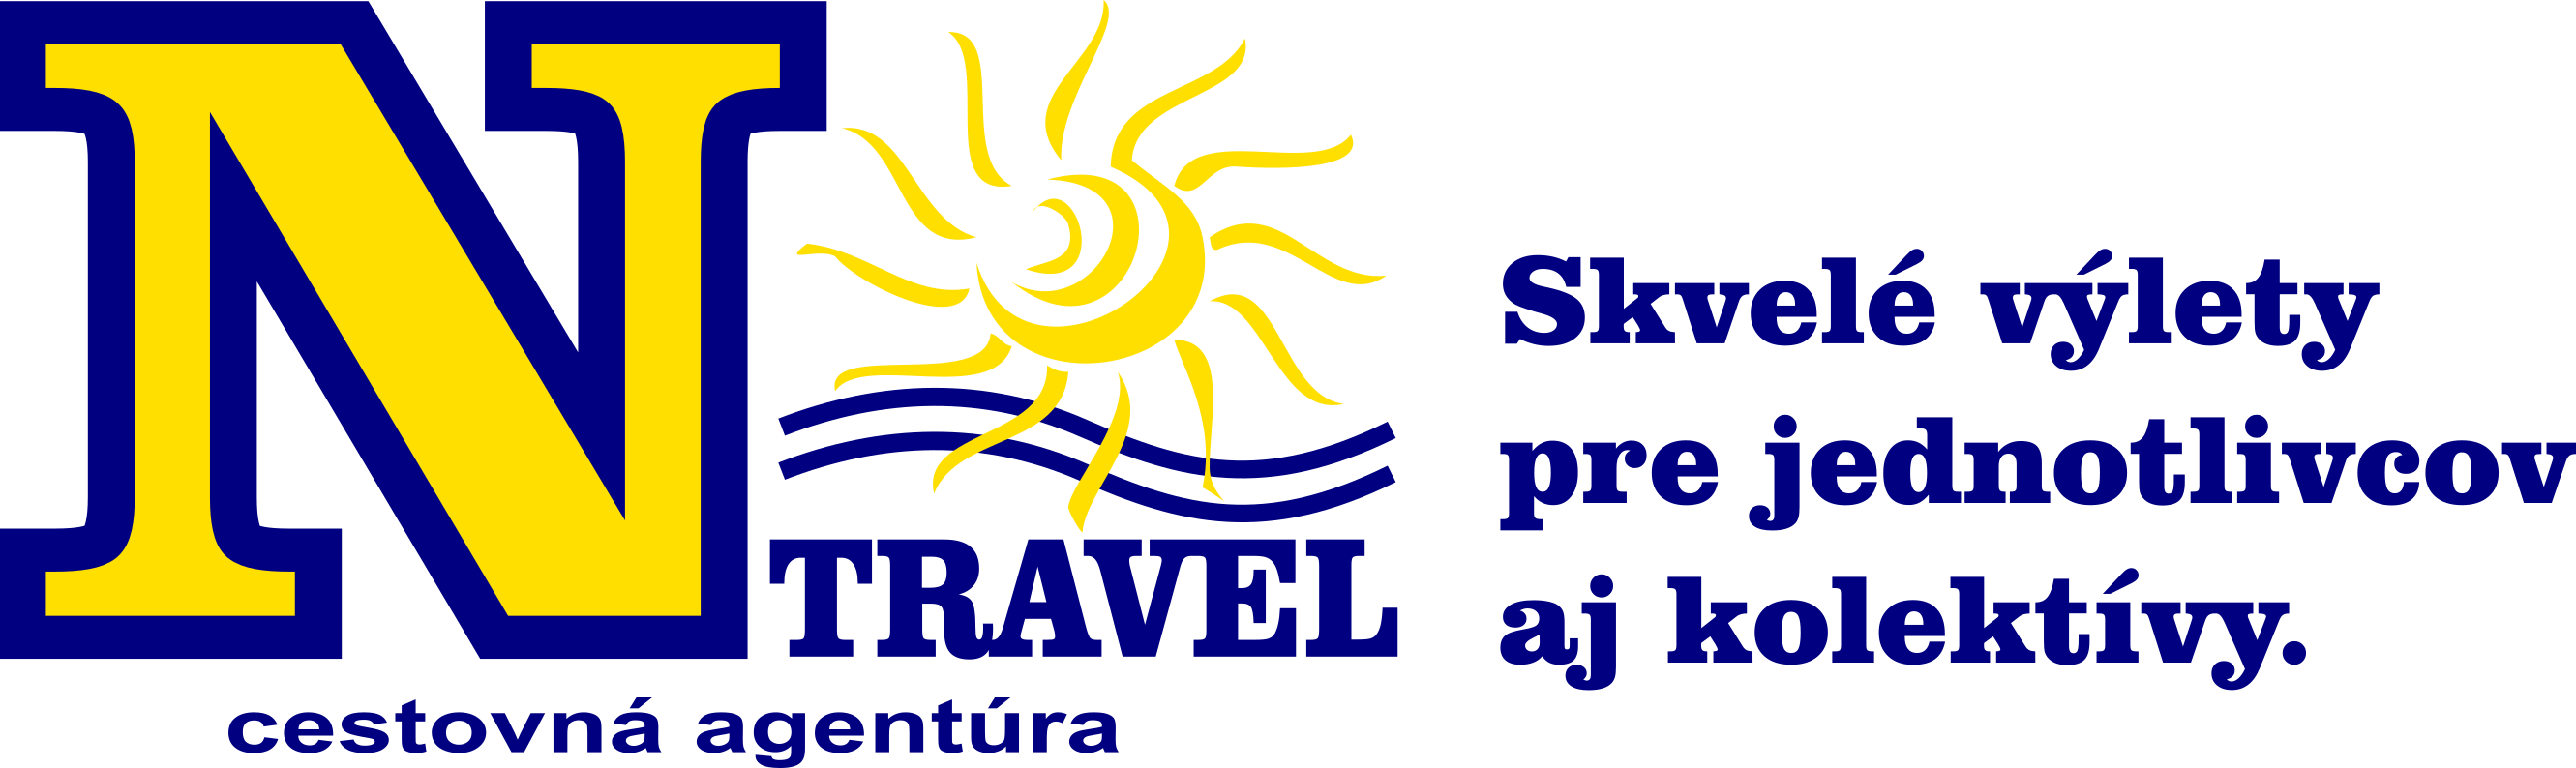 Skvelé výlety | Maďarsko - Skvelé výlety